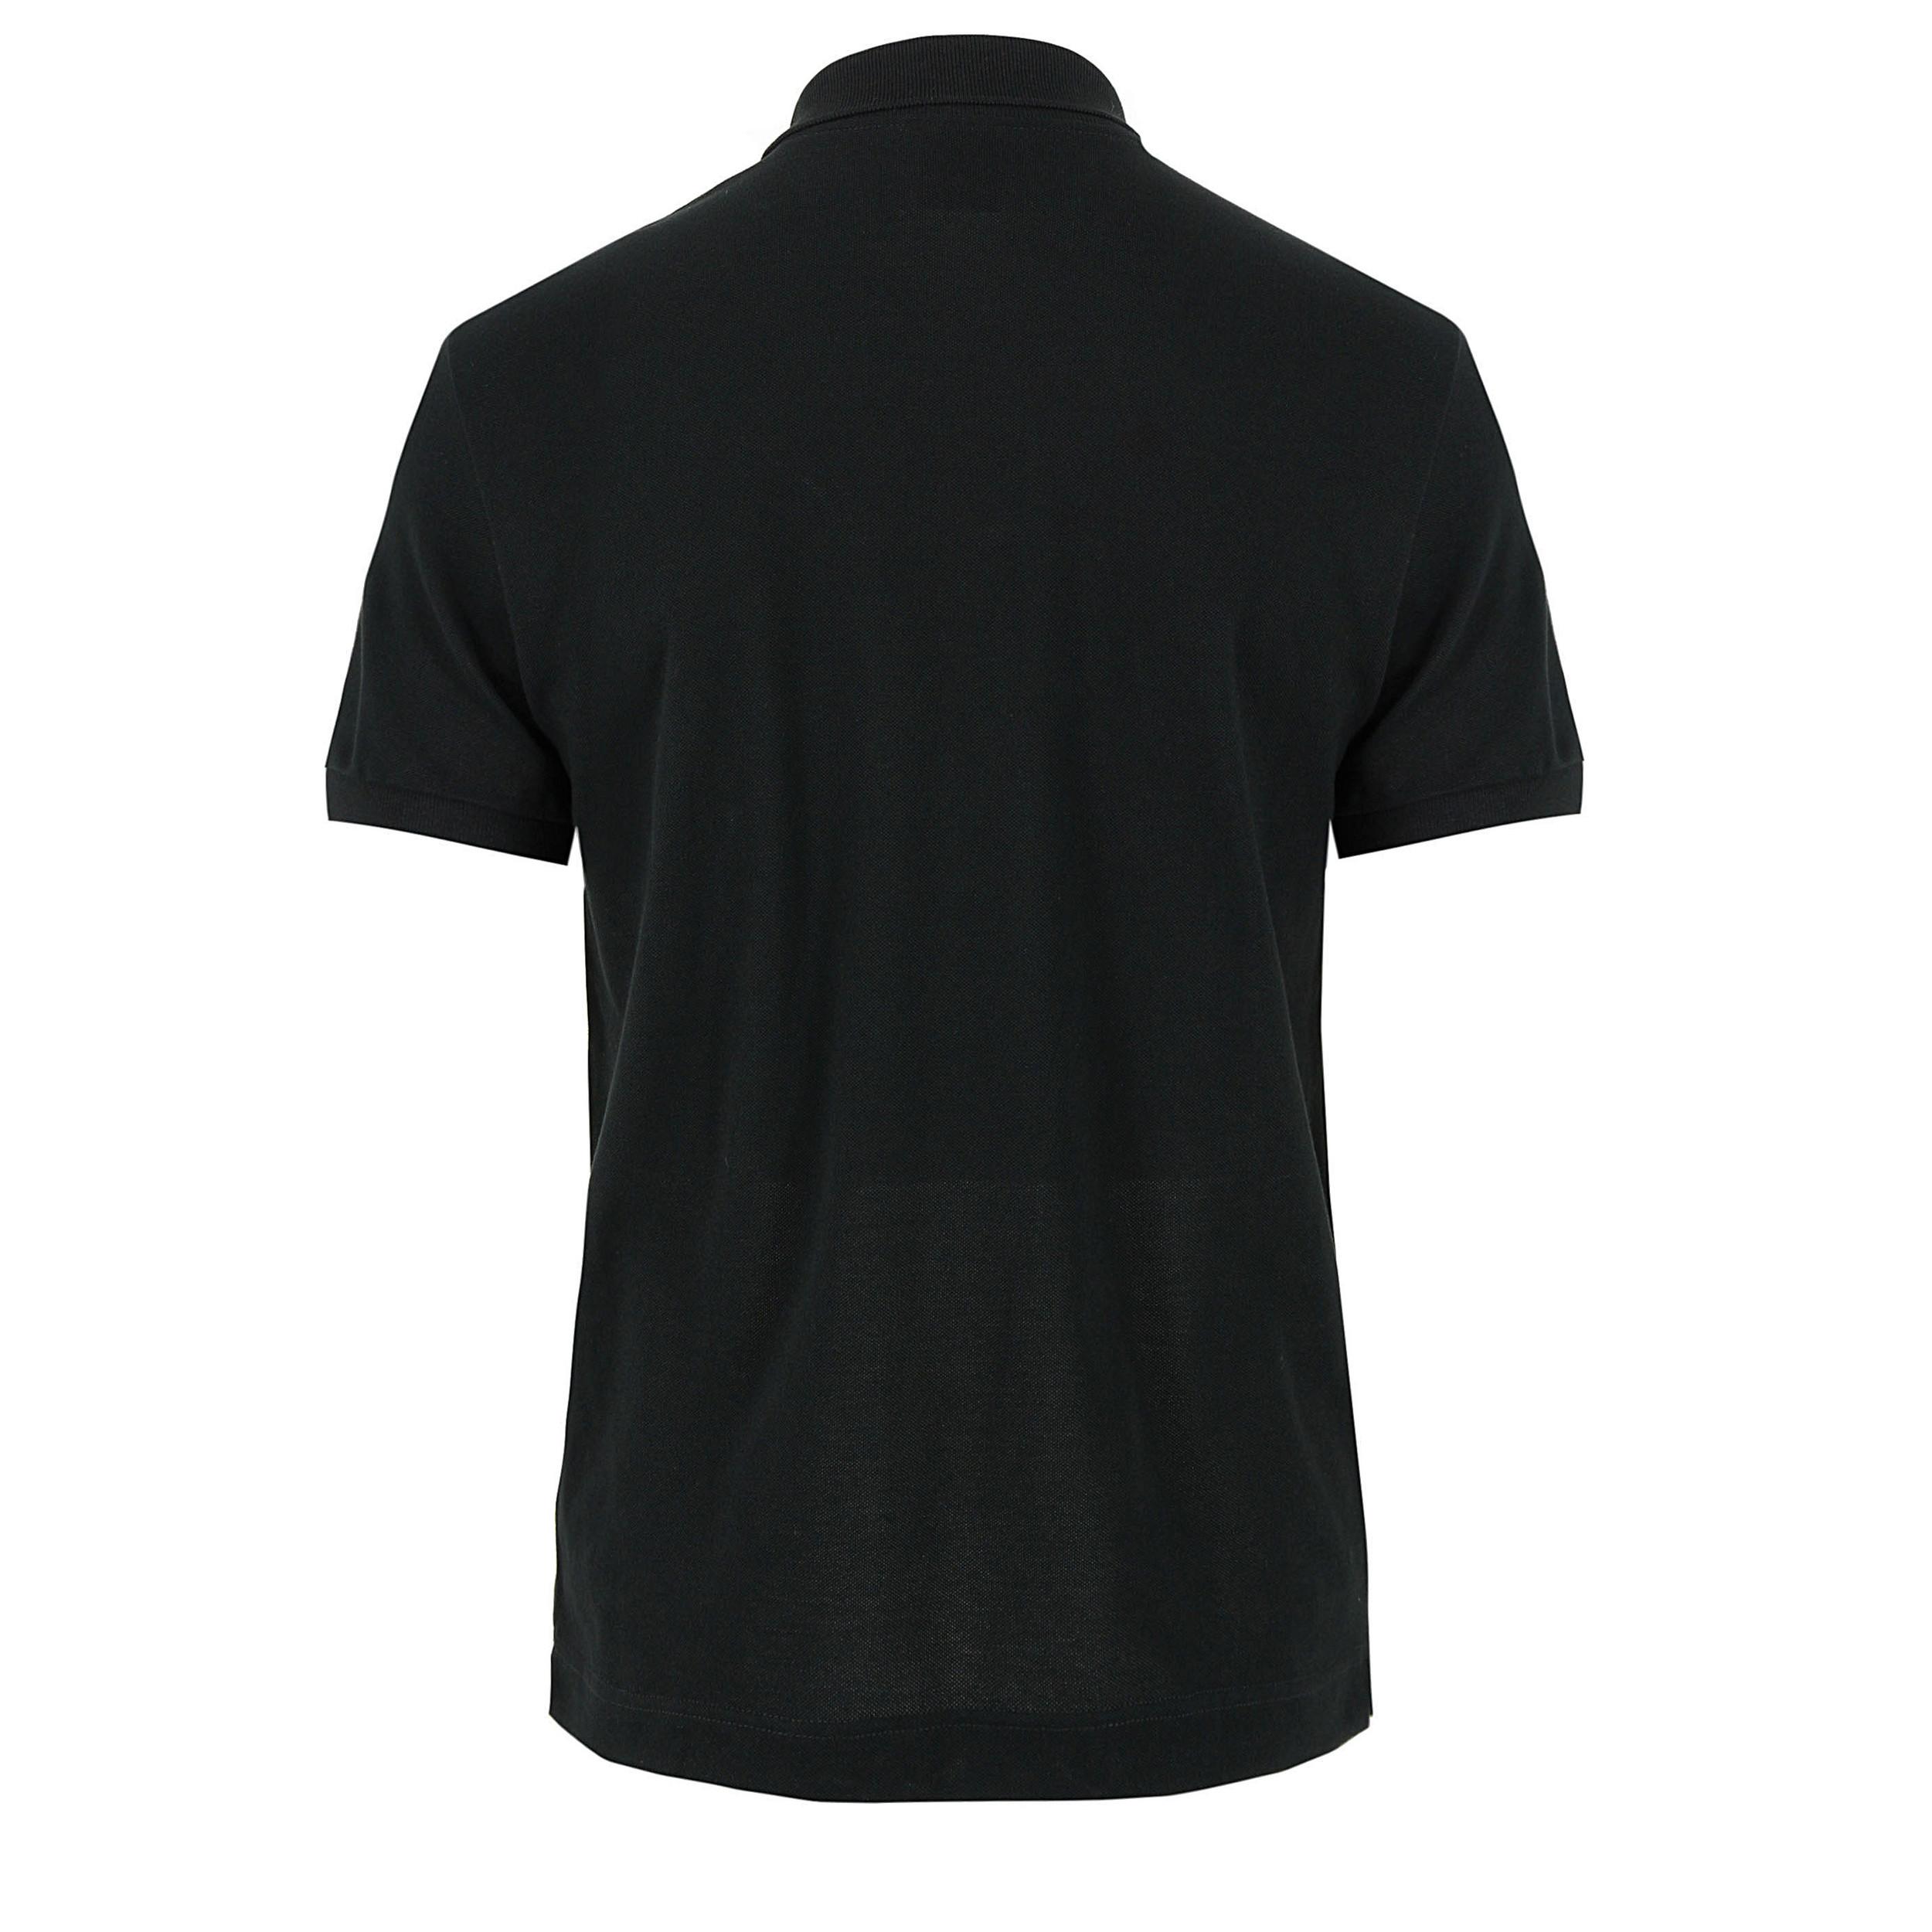 Lacoste l!ive Plain Black Ethnic Croc Polo Shirt in Black ...